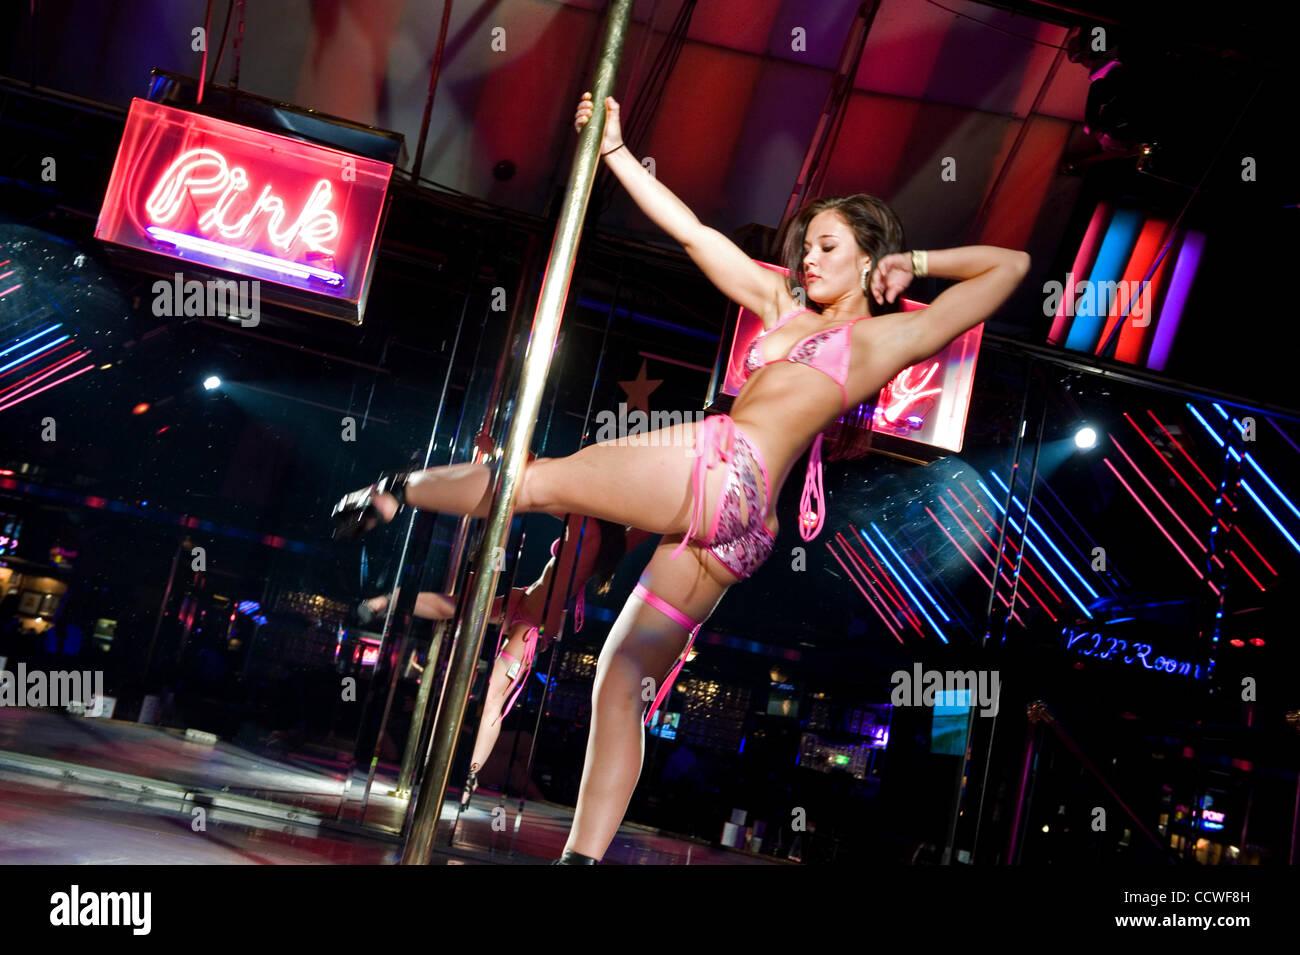 Atlanta tranny strip clubs, internet dream girlfriend nude